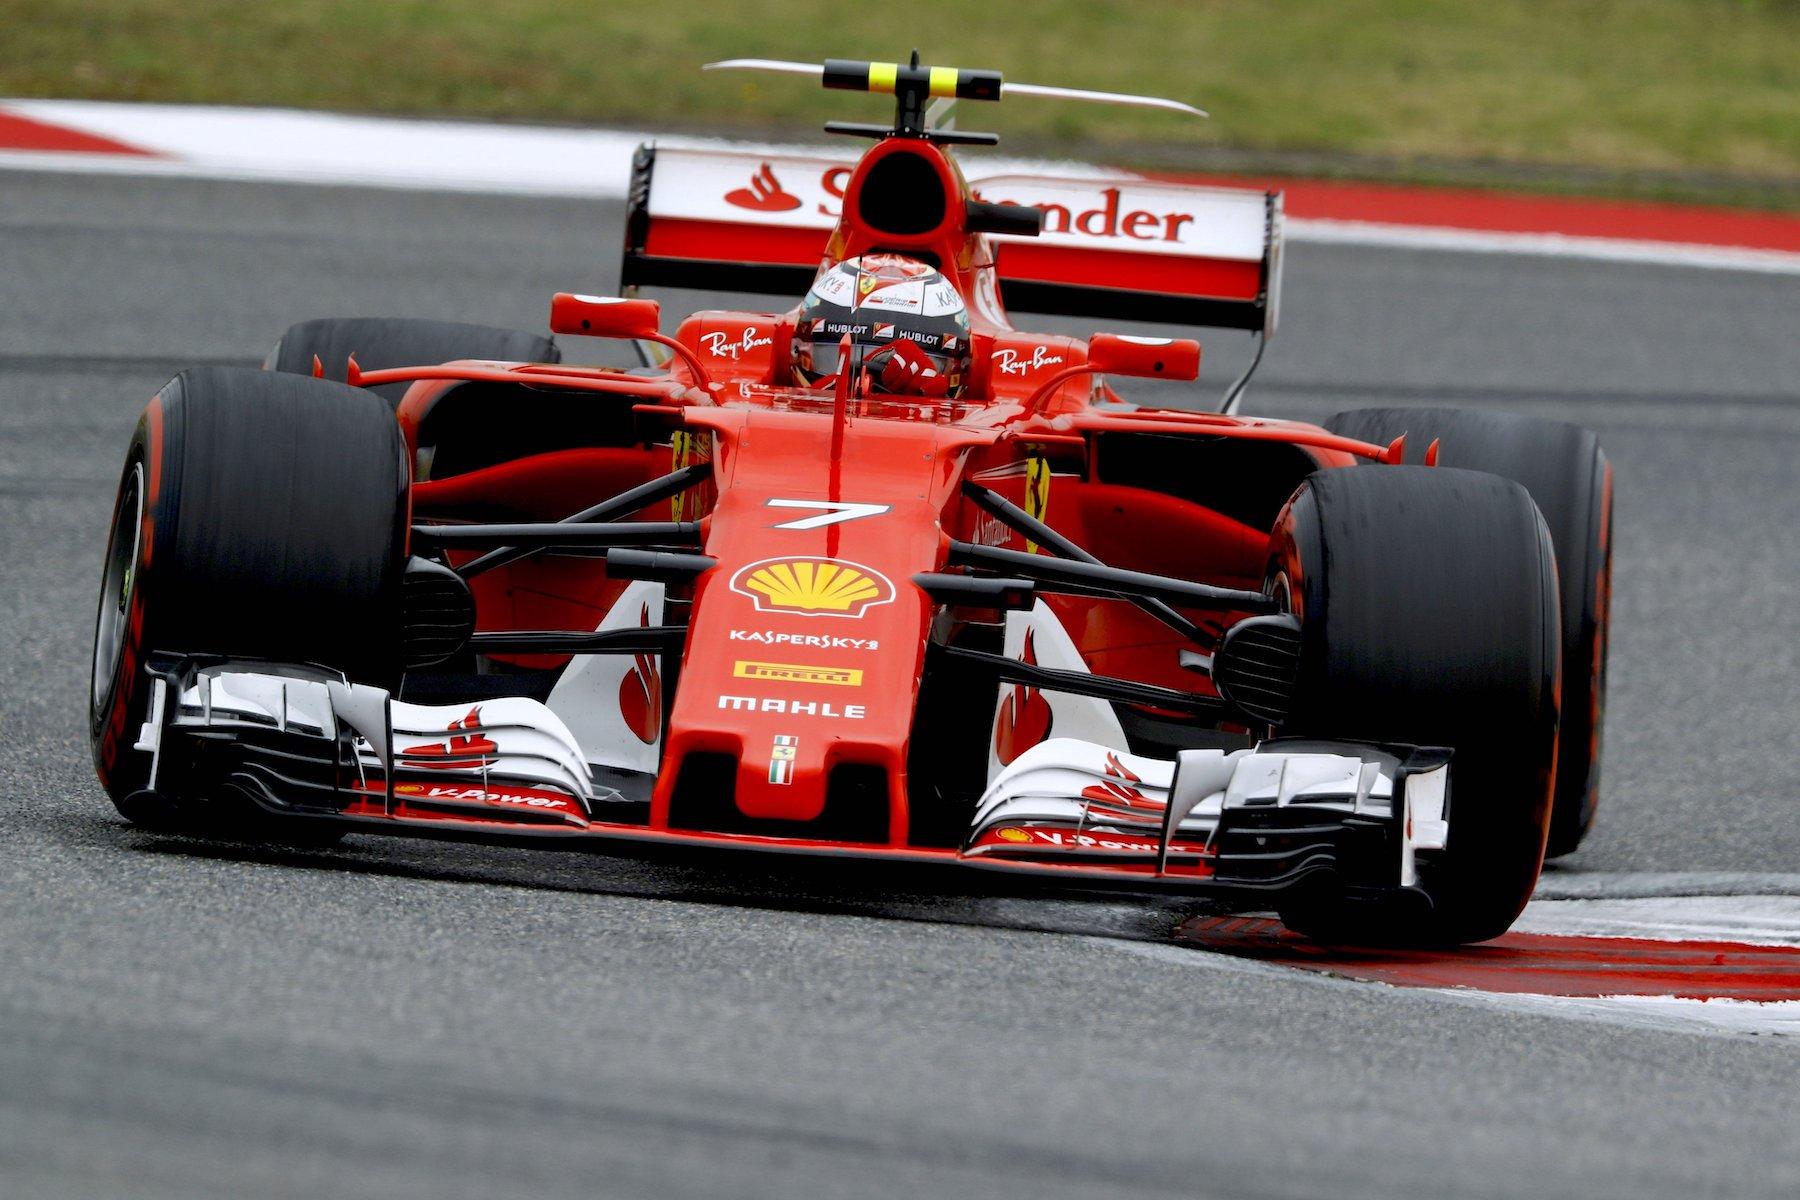 F 2017 Kimi Raikkonen and Sebastian Vettel | Ferrari SF70H | 2017 Chinese GP P5 2 copy.jpg